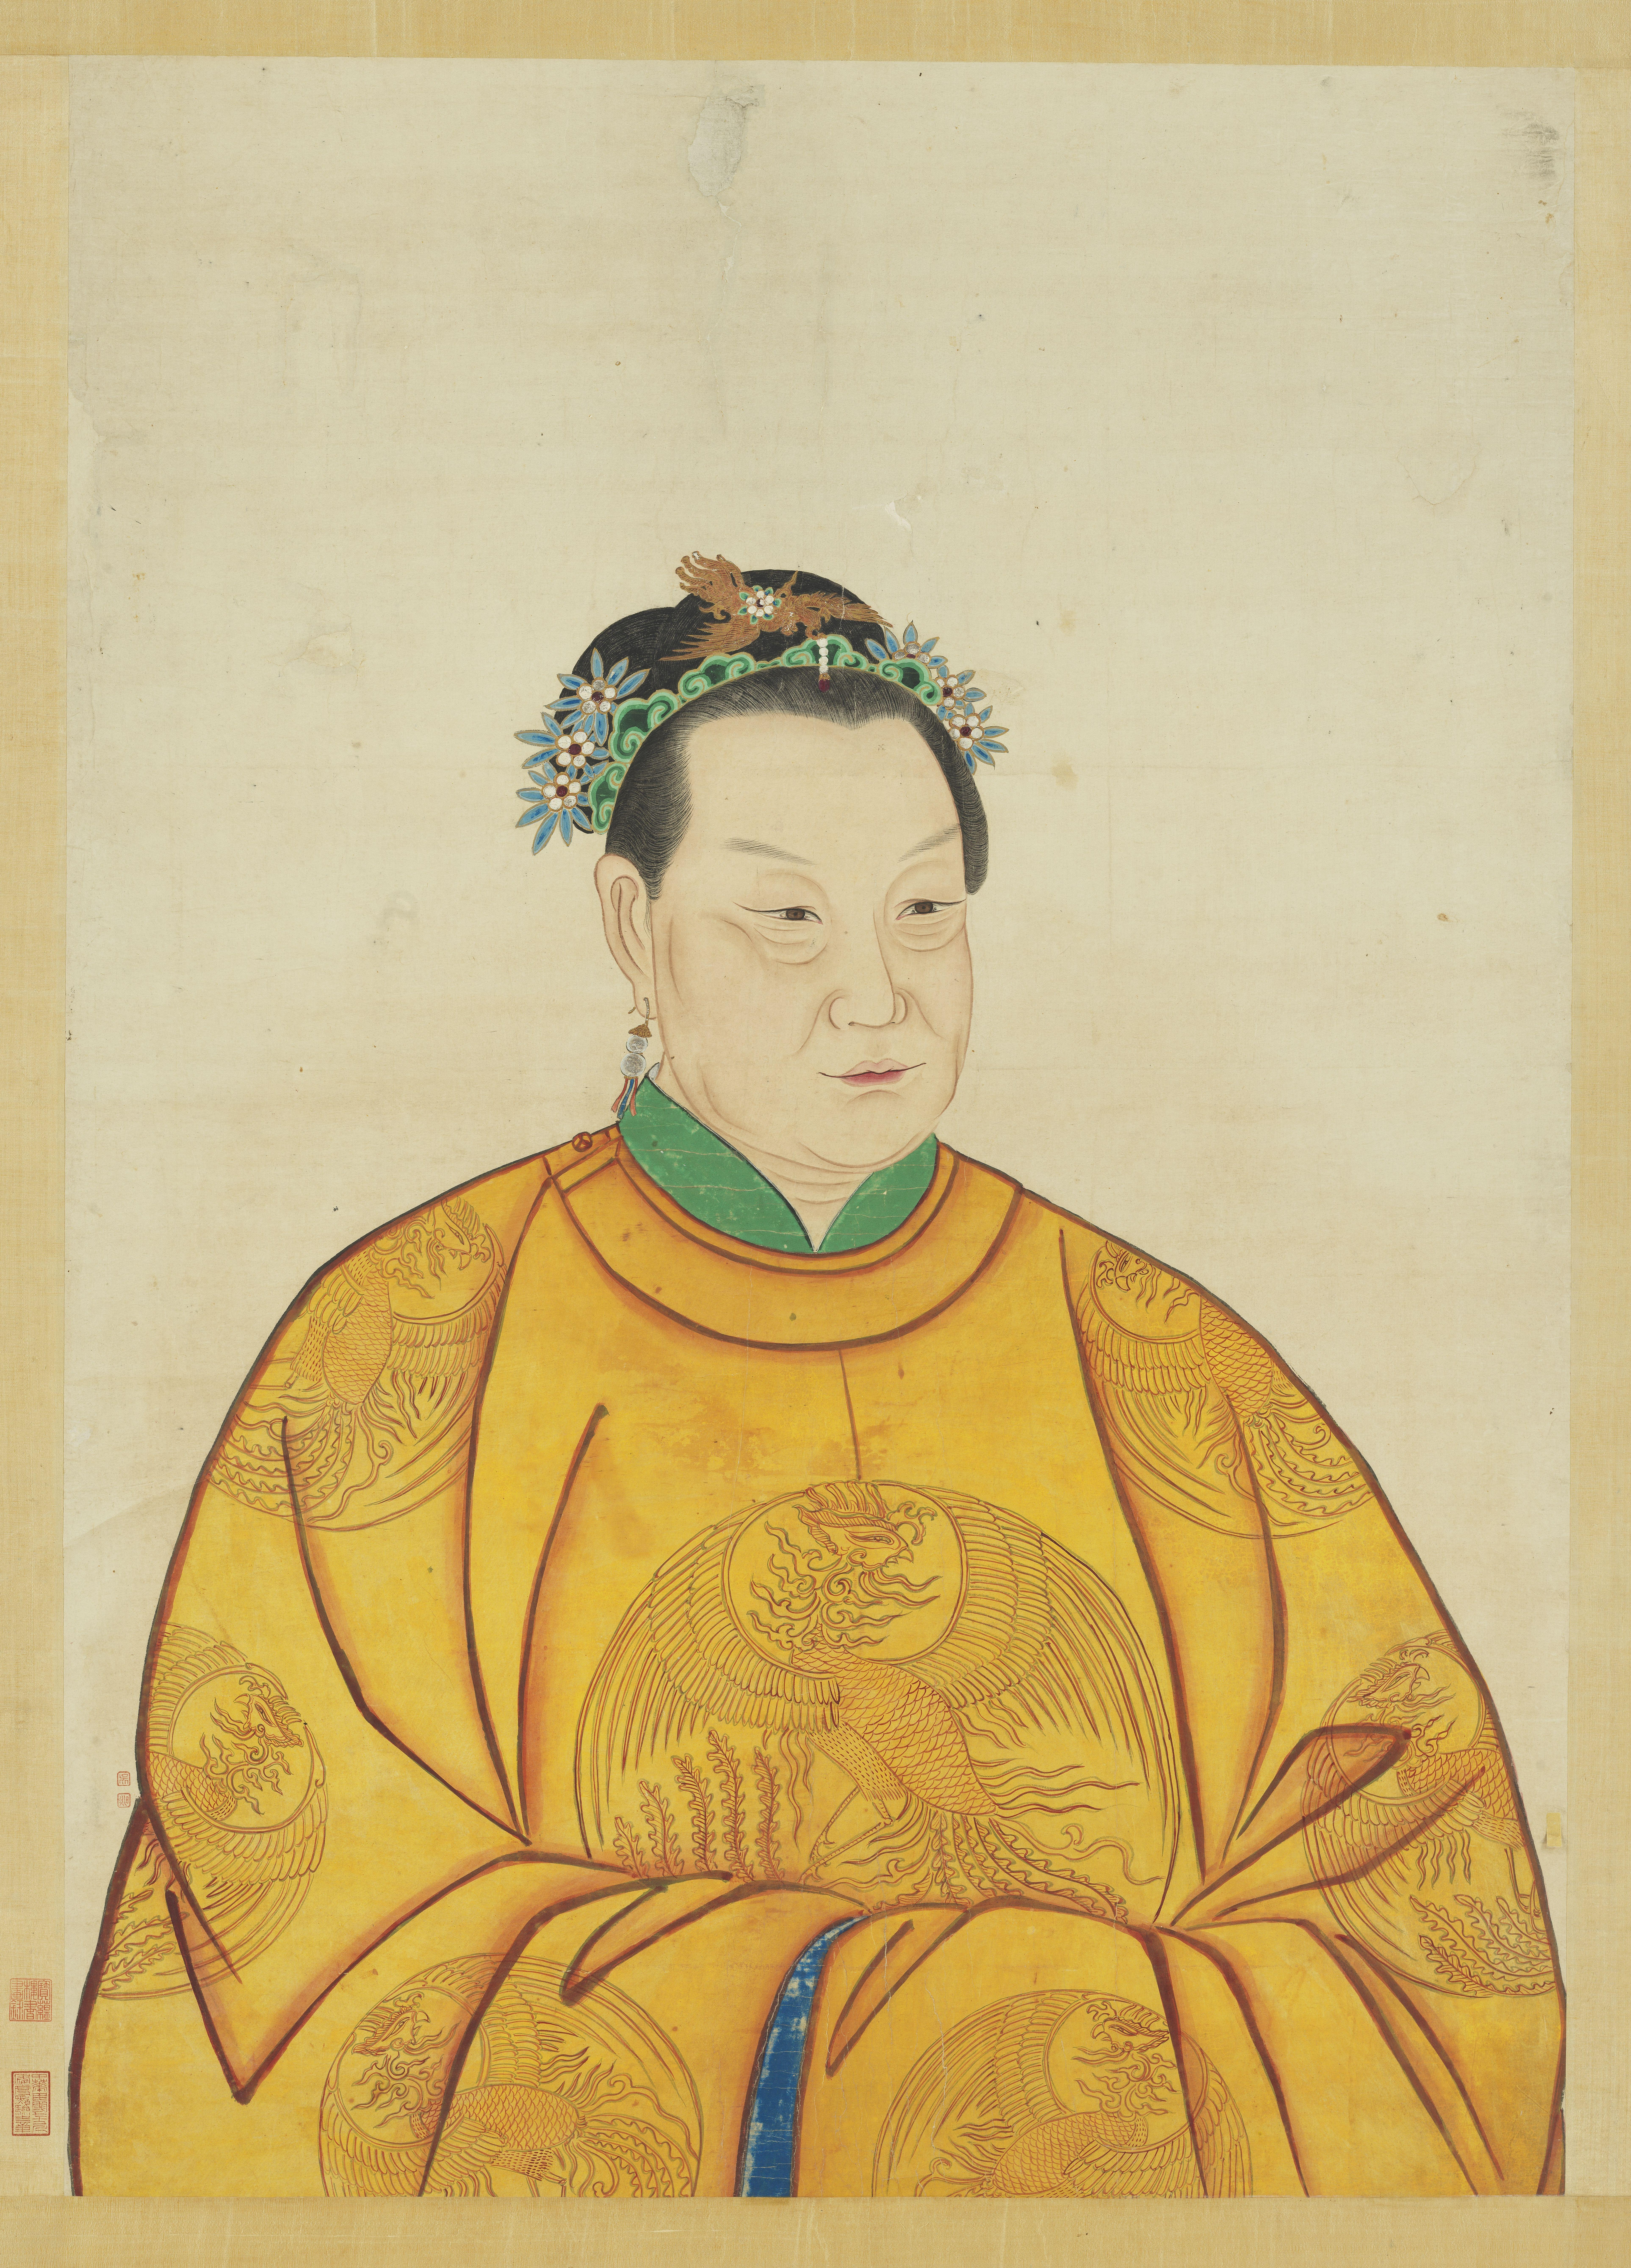 life of hongwu Definitions of hongwu emperor, synonyms, antonyms, derivatives of hongwu emperor, analogical dictionary of hongwu emperor (english.